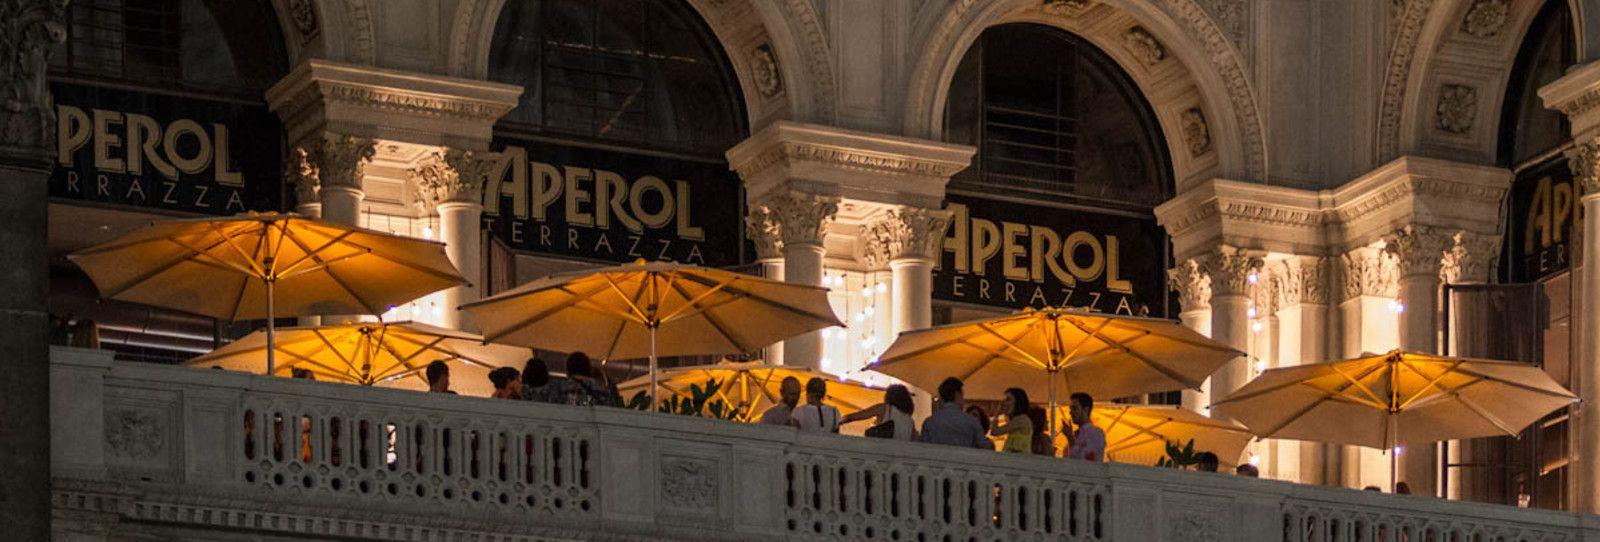 Terrazza Aperol Milano Milan Milan